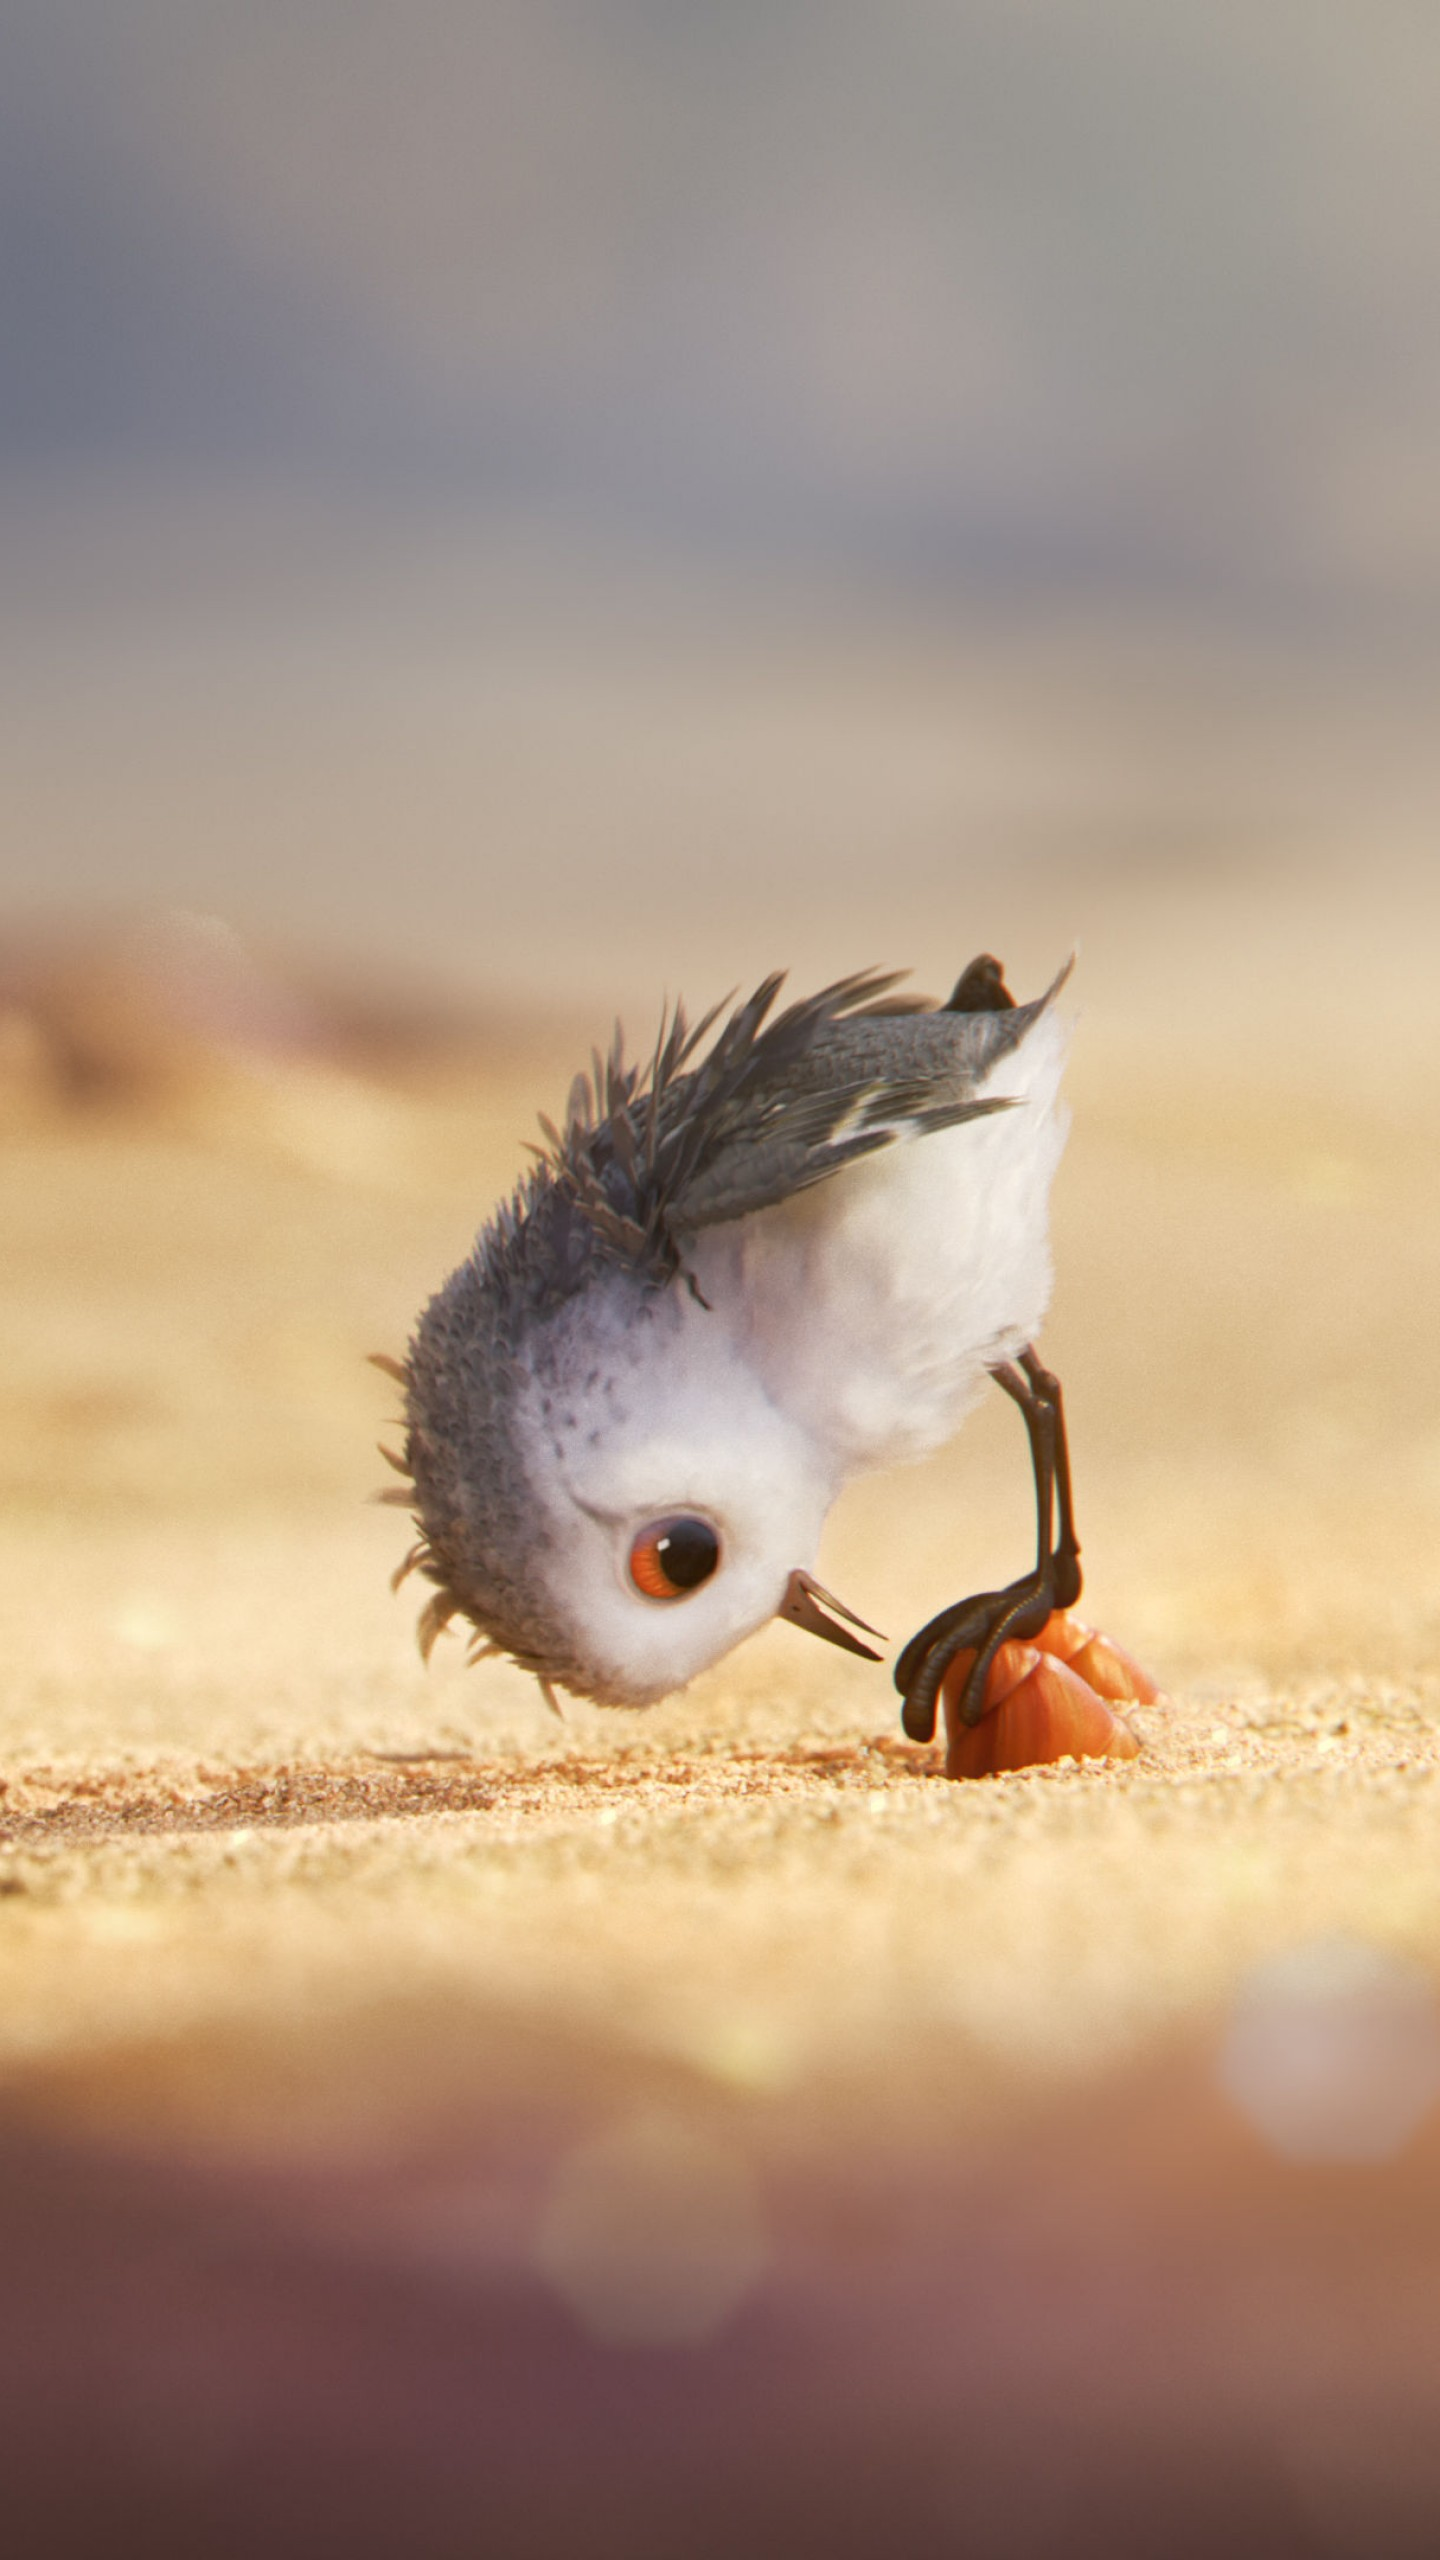 Wallpaper Piper, bird, pixar, Movies #11284